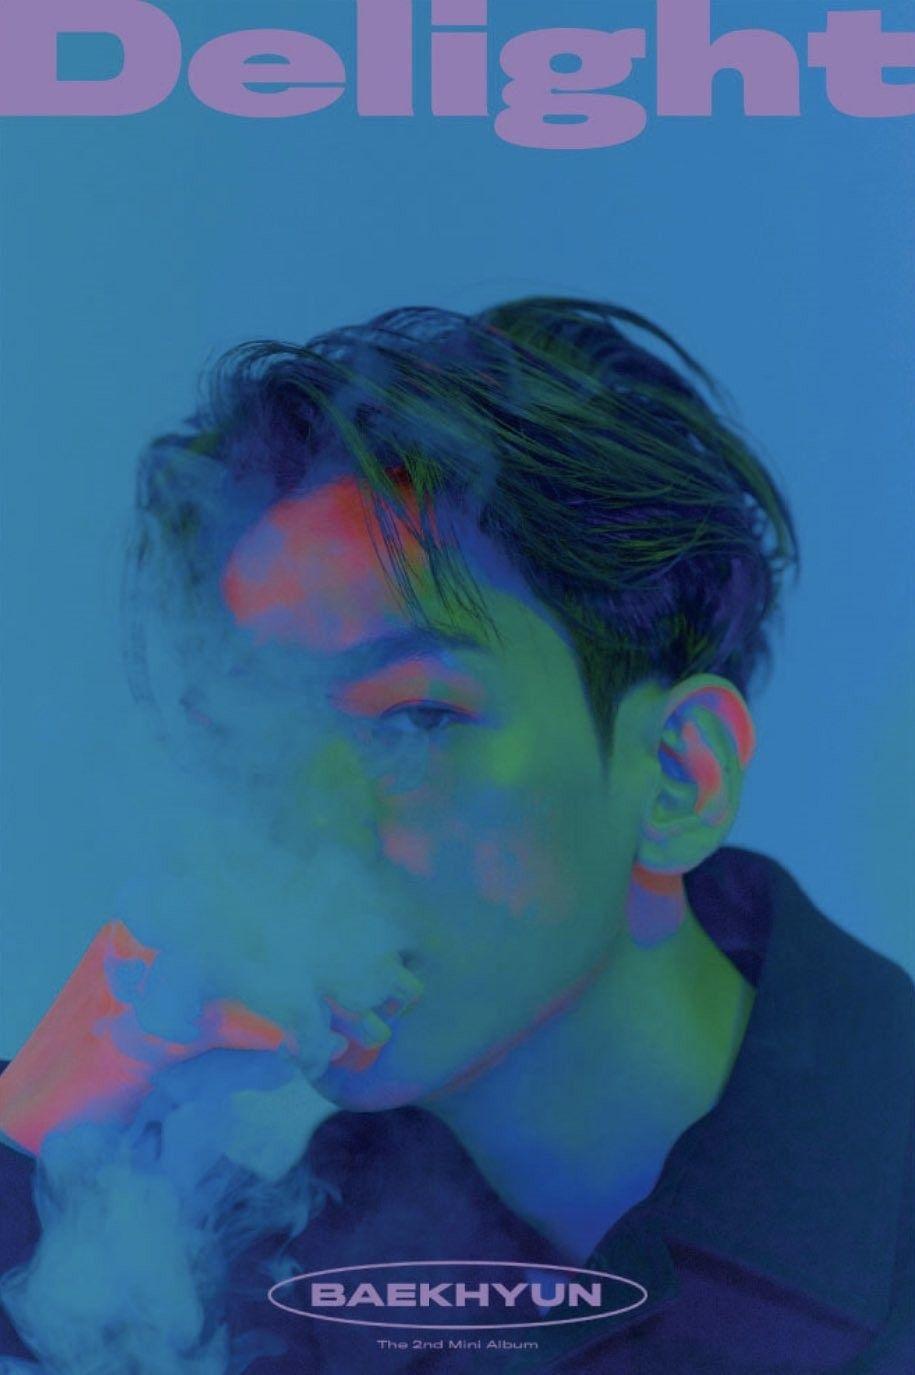 BAEKHYUN 2nd mini album 'Delight' - cinnamon ver kihno poster | Baekhyun,  Mini albums, Kpop posters